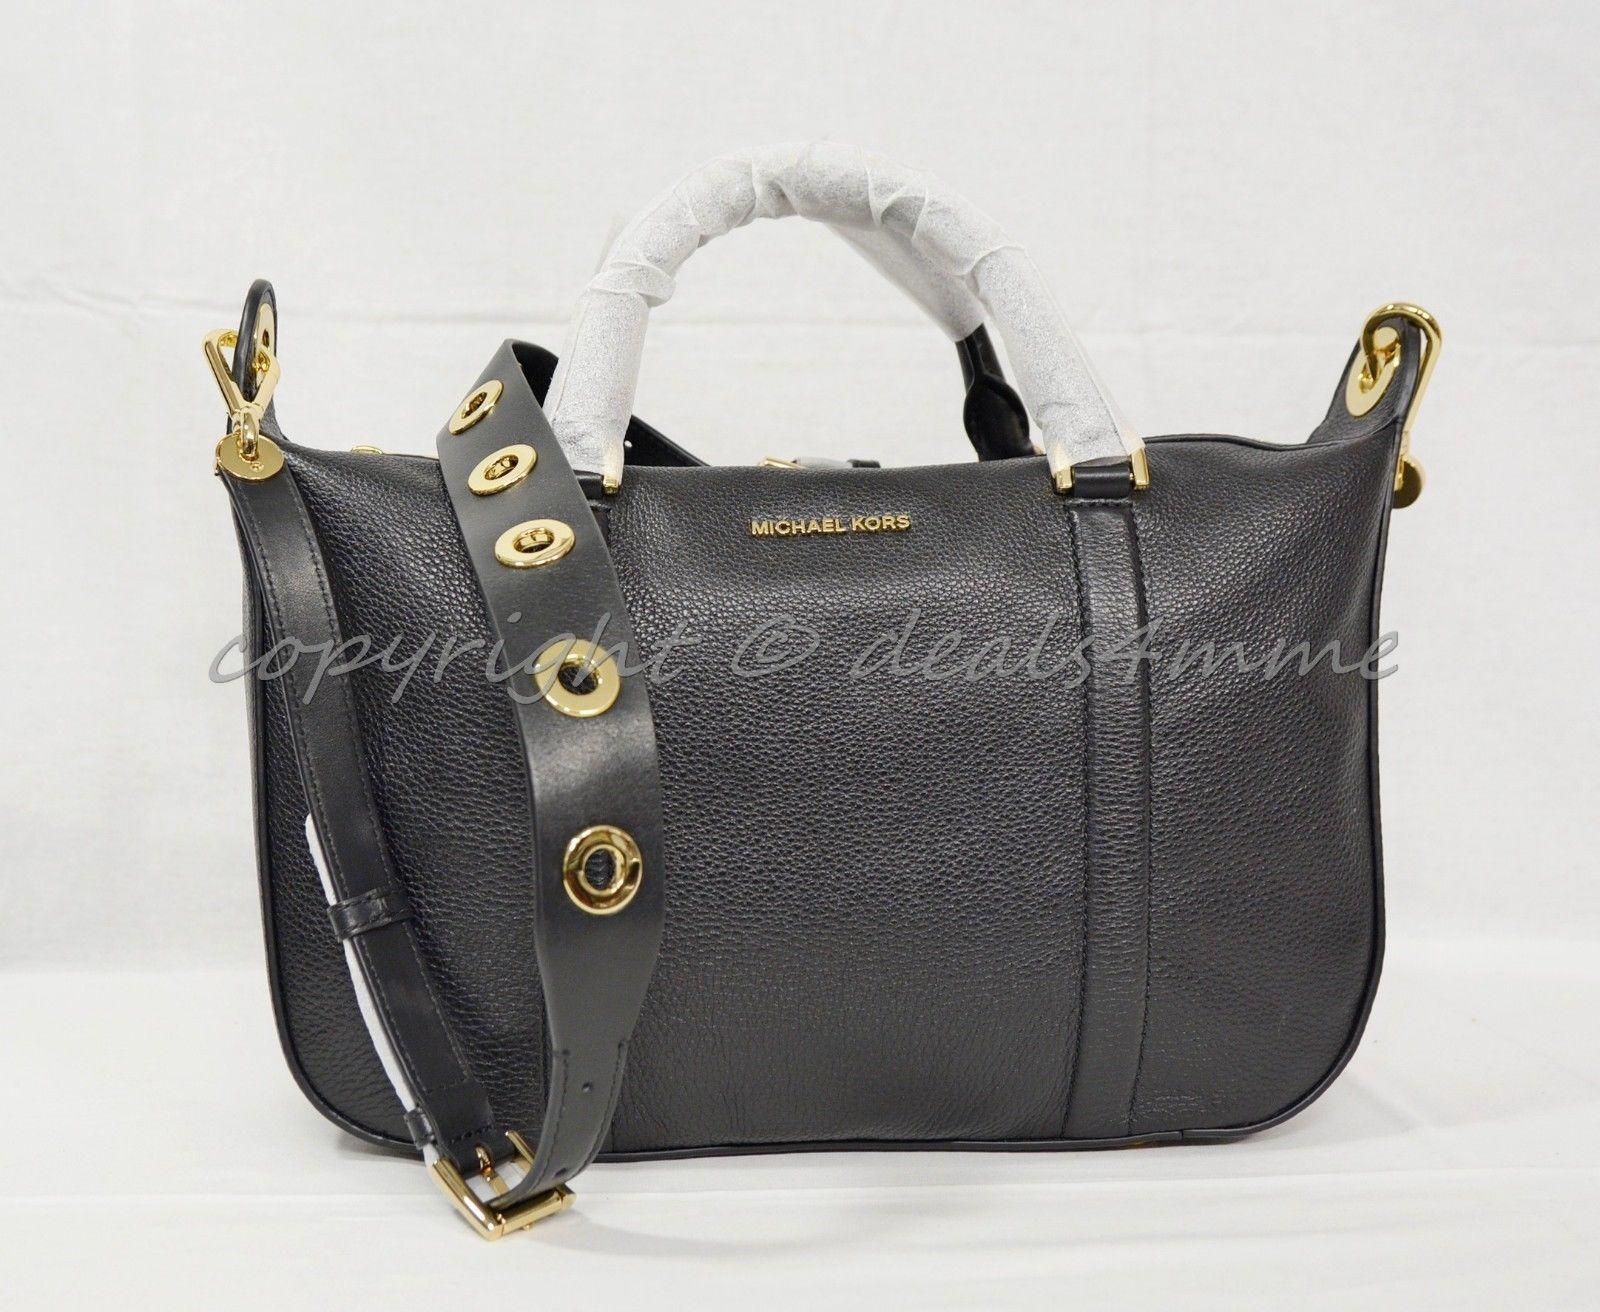 39938c63fb62 Michael Kors Raven Grommet Large Leather and 50 similar items. S l1600